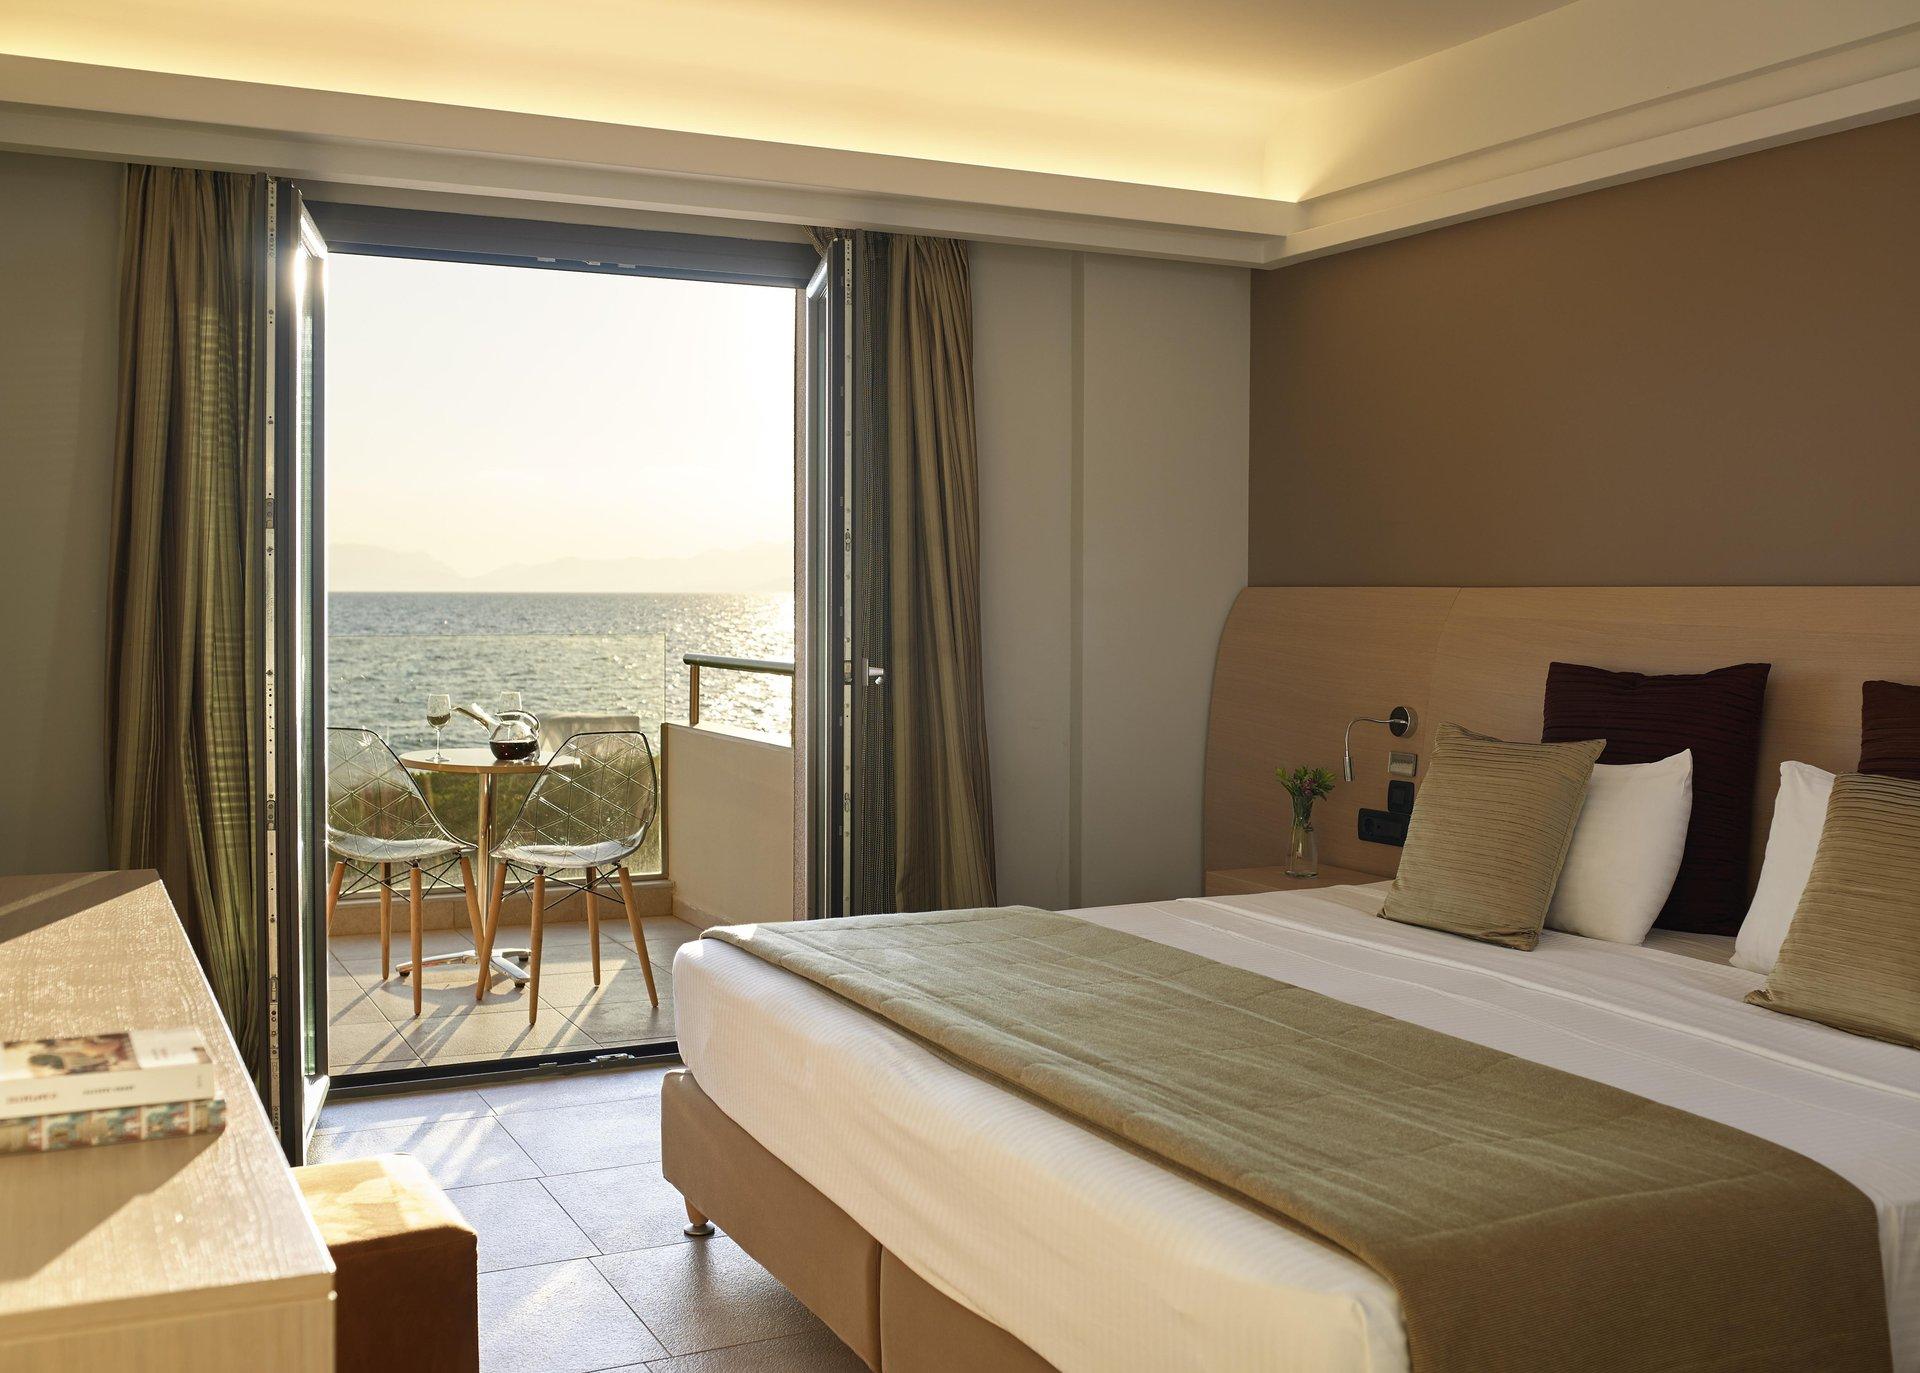 Hotel Alas Resort & Spa - Elia - Lakonia - kamer superior zeezicht